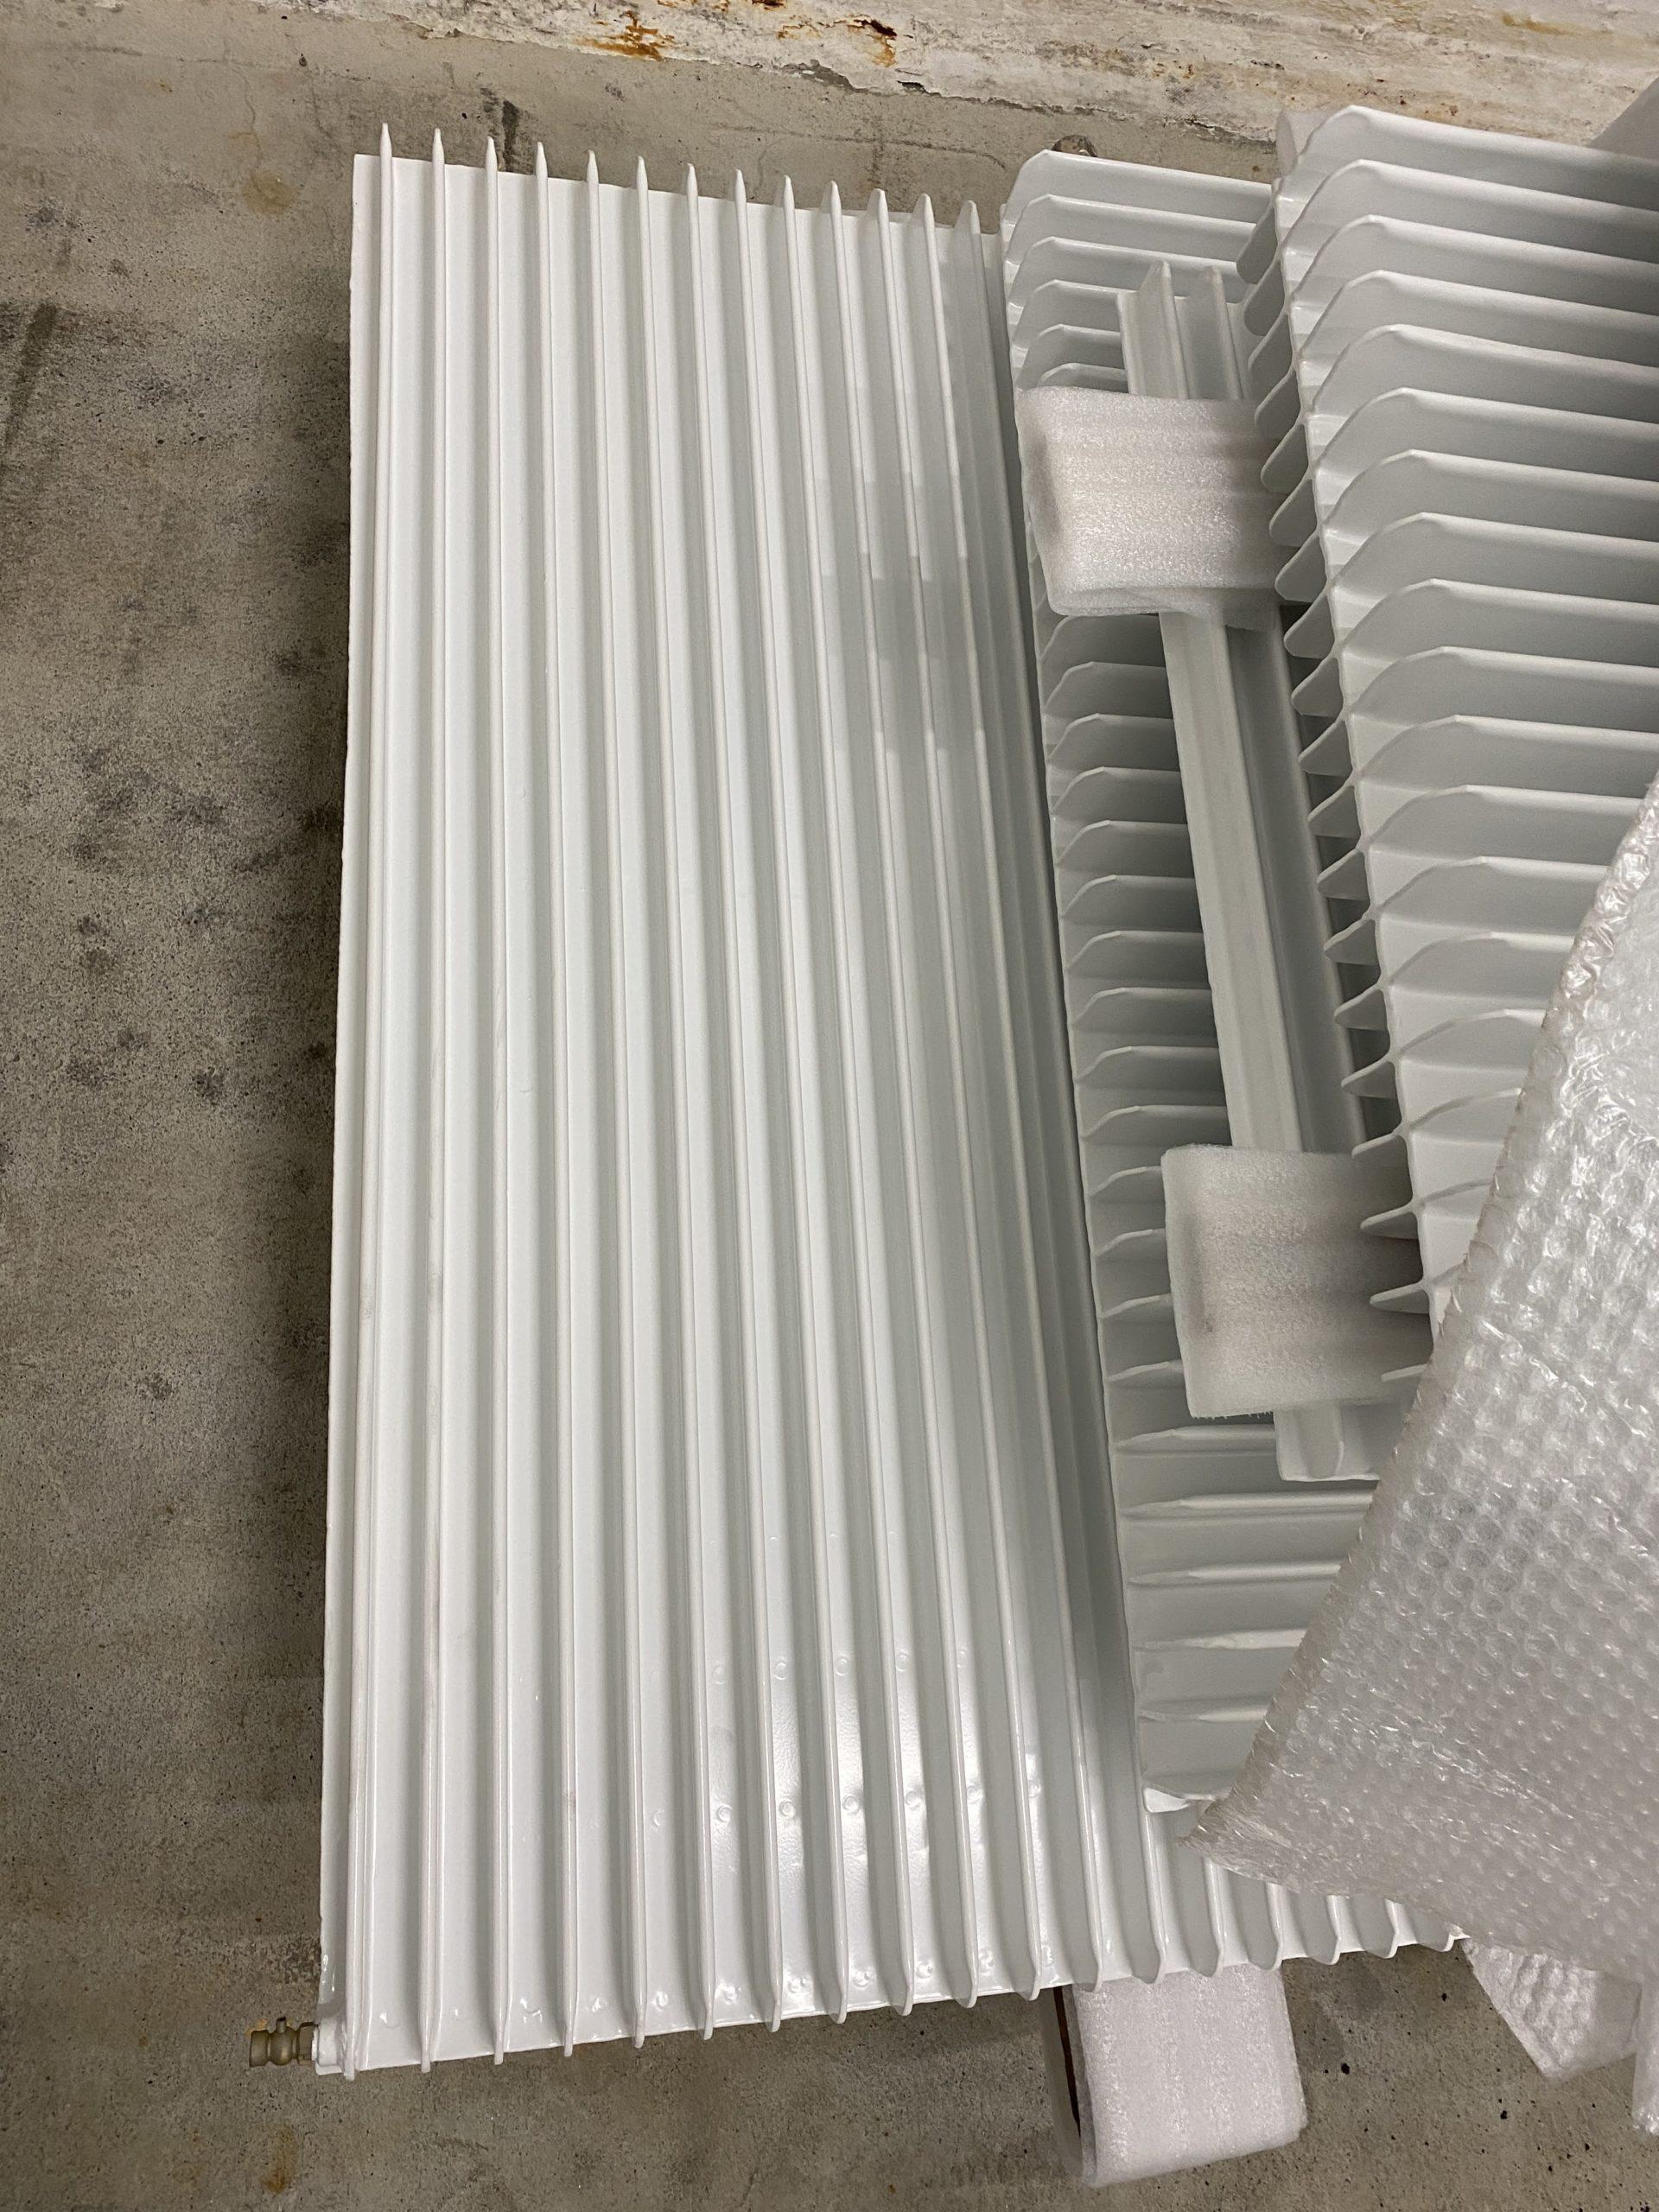 Thermolaquage des radiateurs